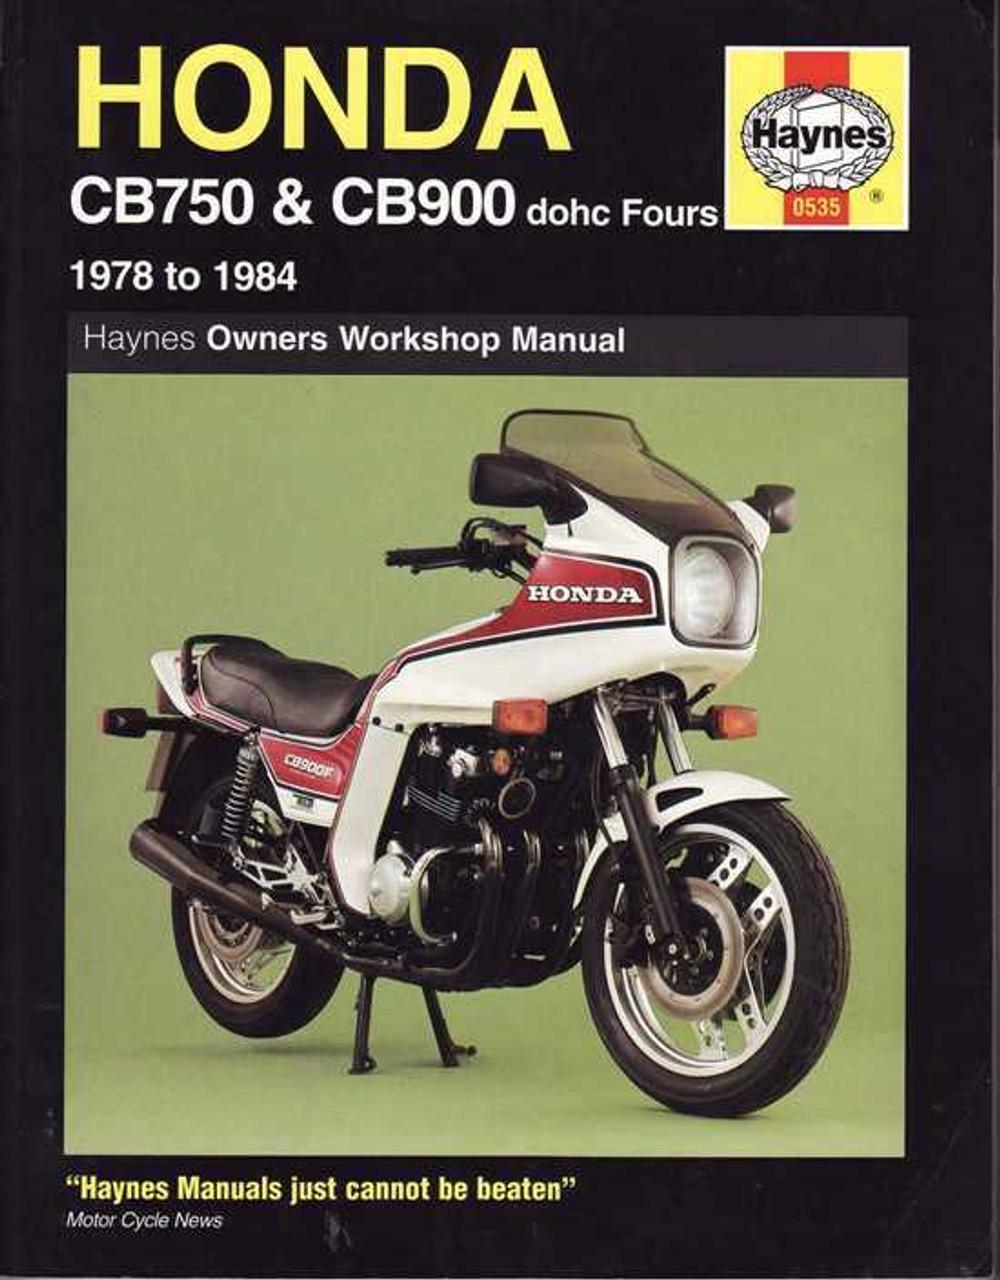 honda cb750 amp cb900 dohc fours 1978 1984 workshop manual rh automotobookshop com au 1975 honda cb750 service manual honda cb750 owners manual